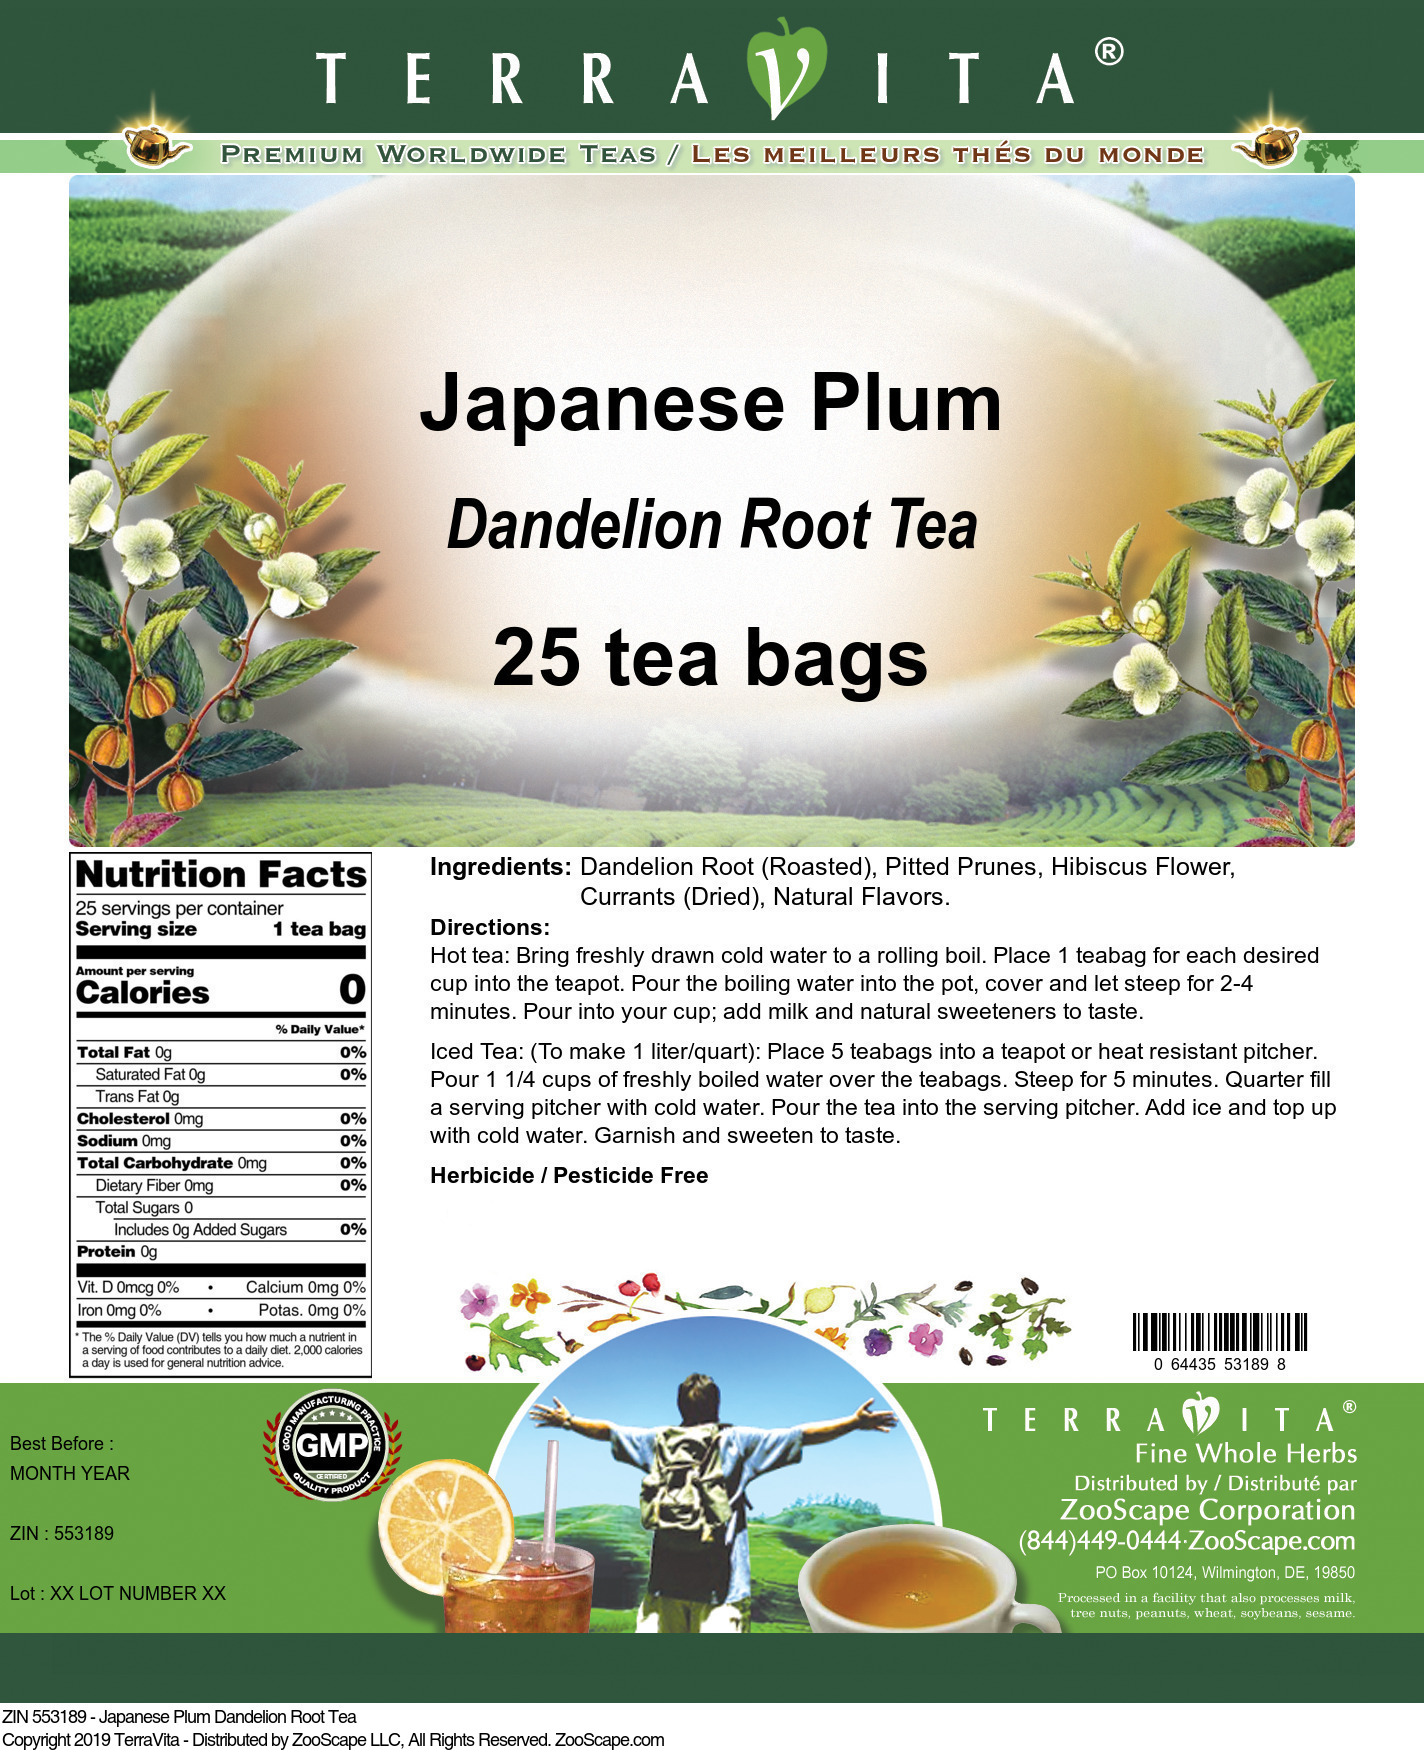 Japanese Plum Dandelion Root Tea